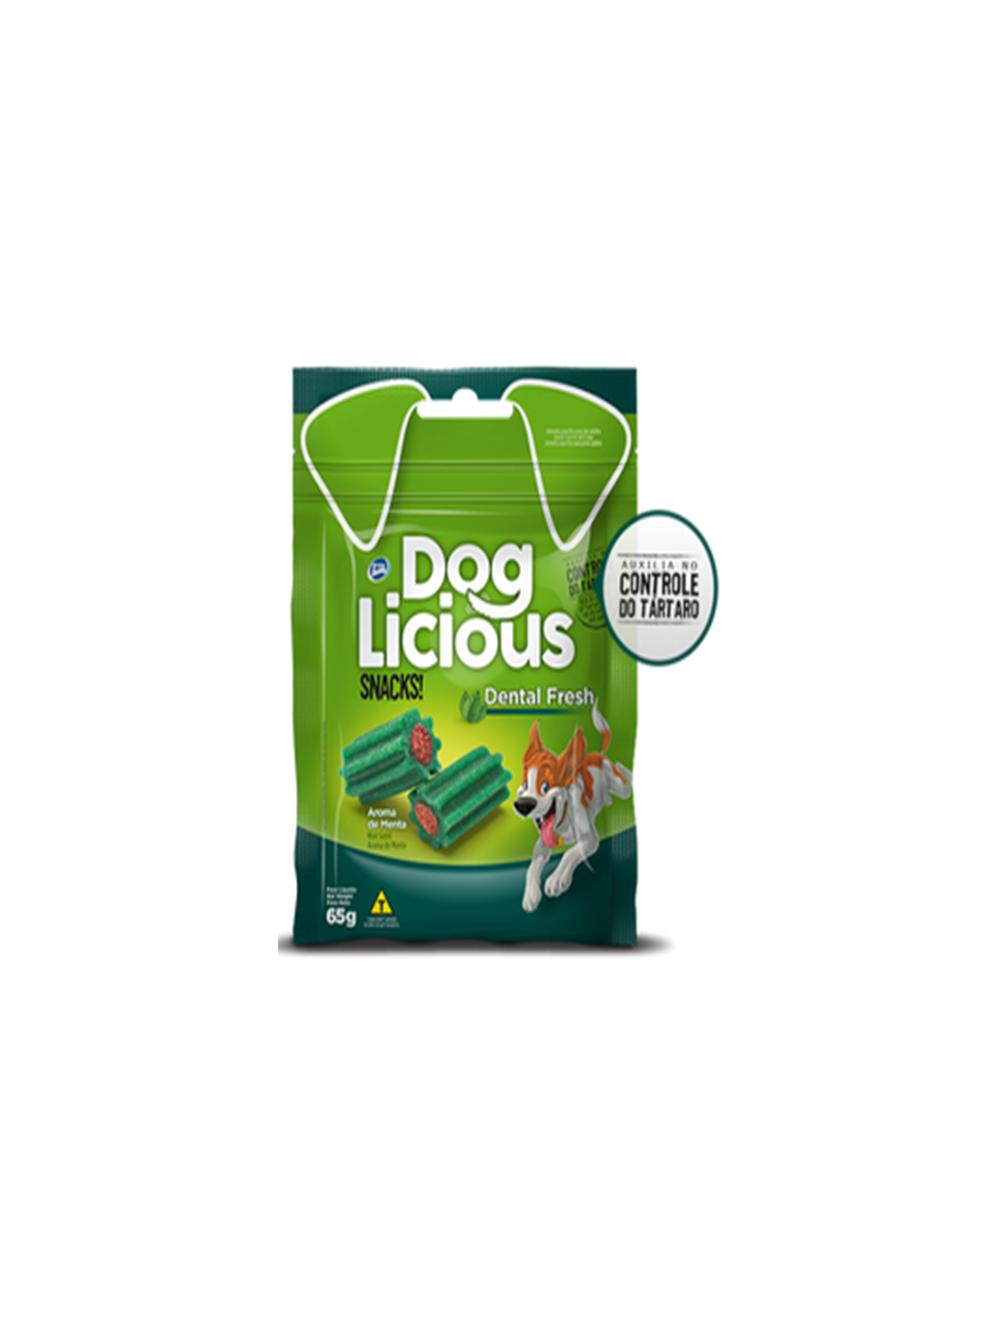 Dog Licious Snack Para Perros Dental Fresh x 65g